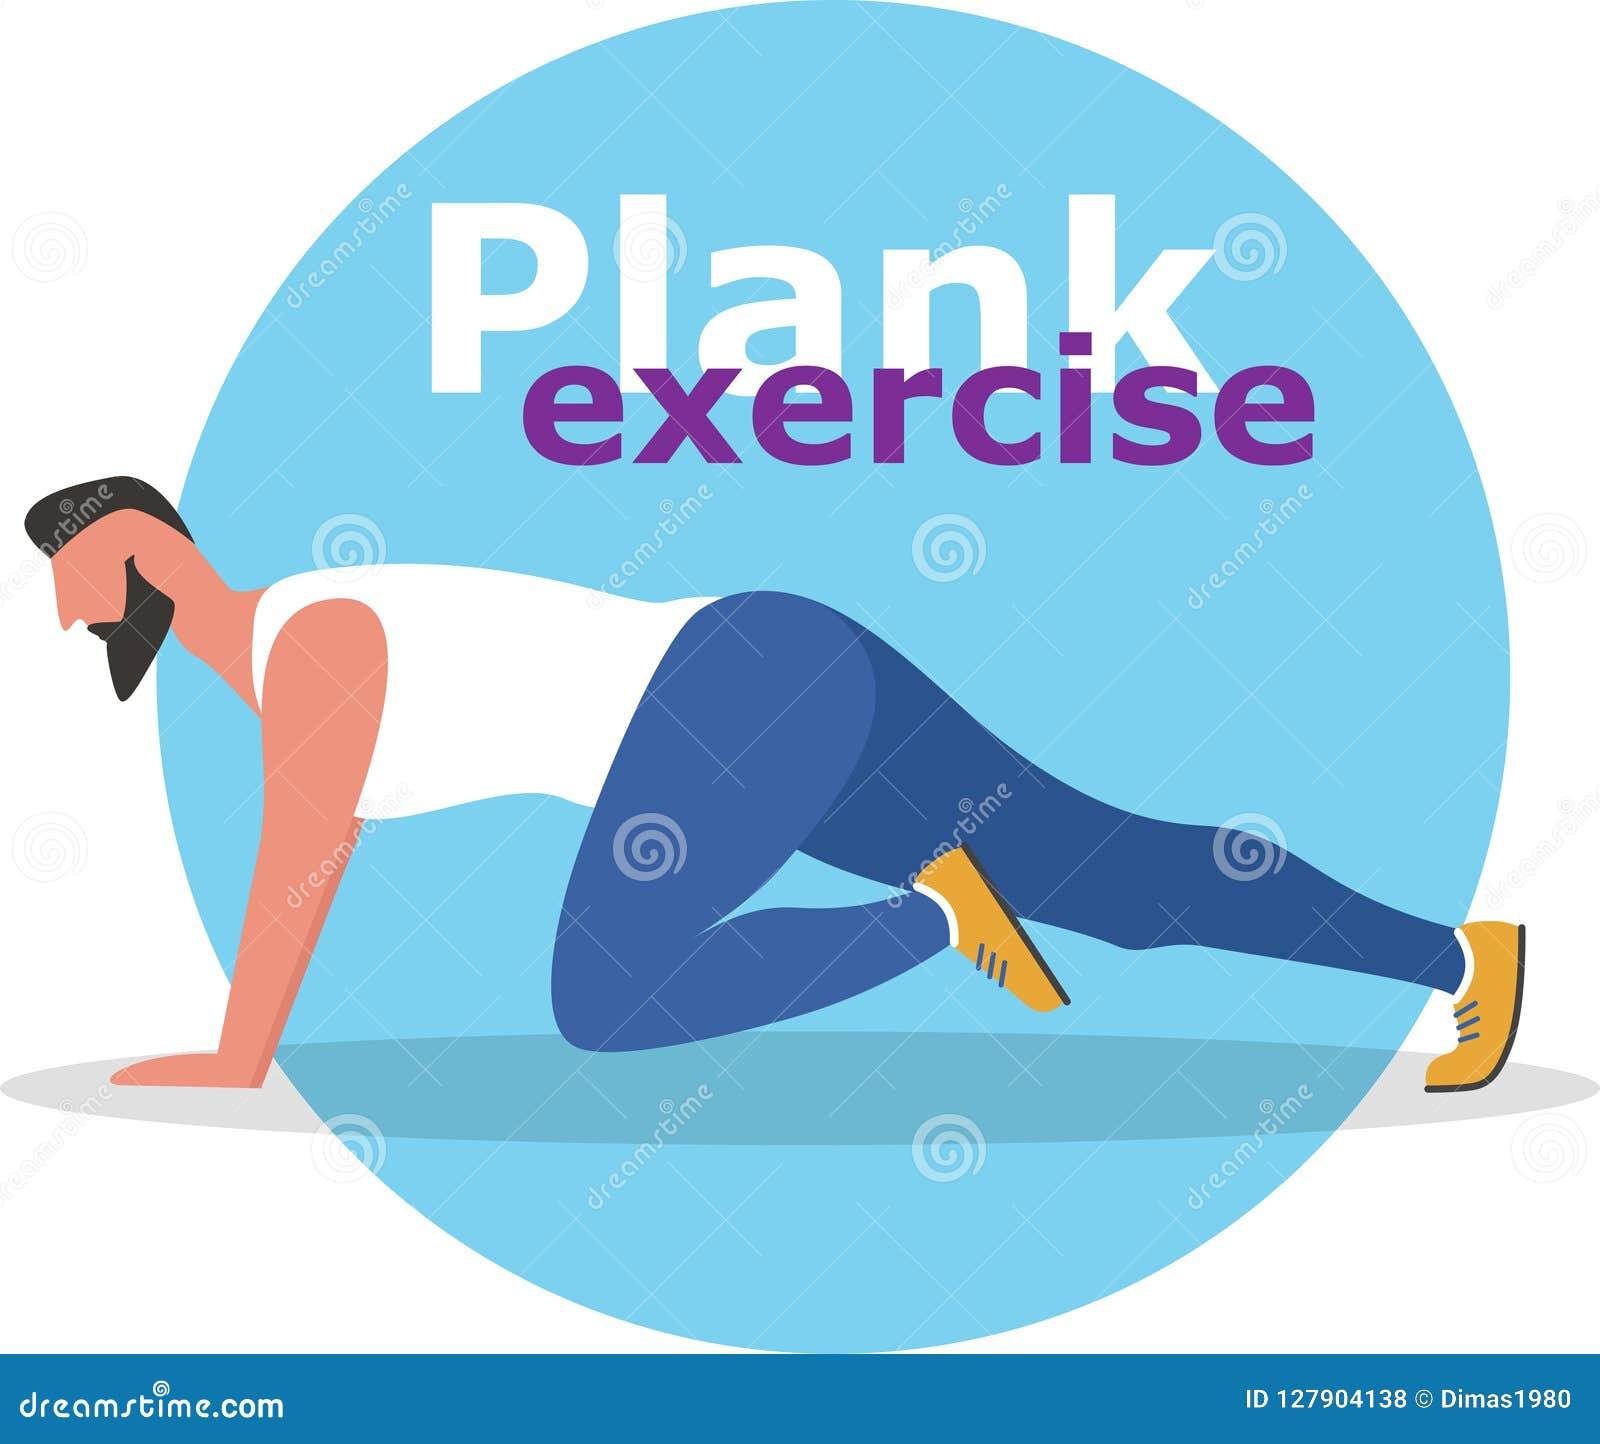 Fitness Man Doing Planking Exercise Stock Vector Illustration Of Sport Challenge 127904138